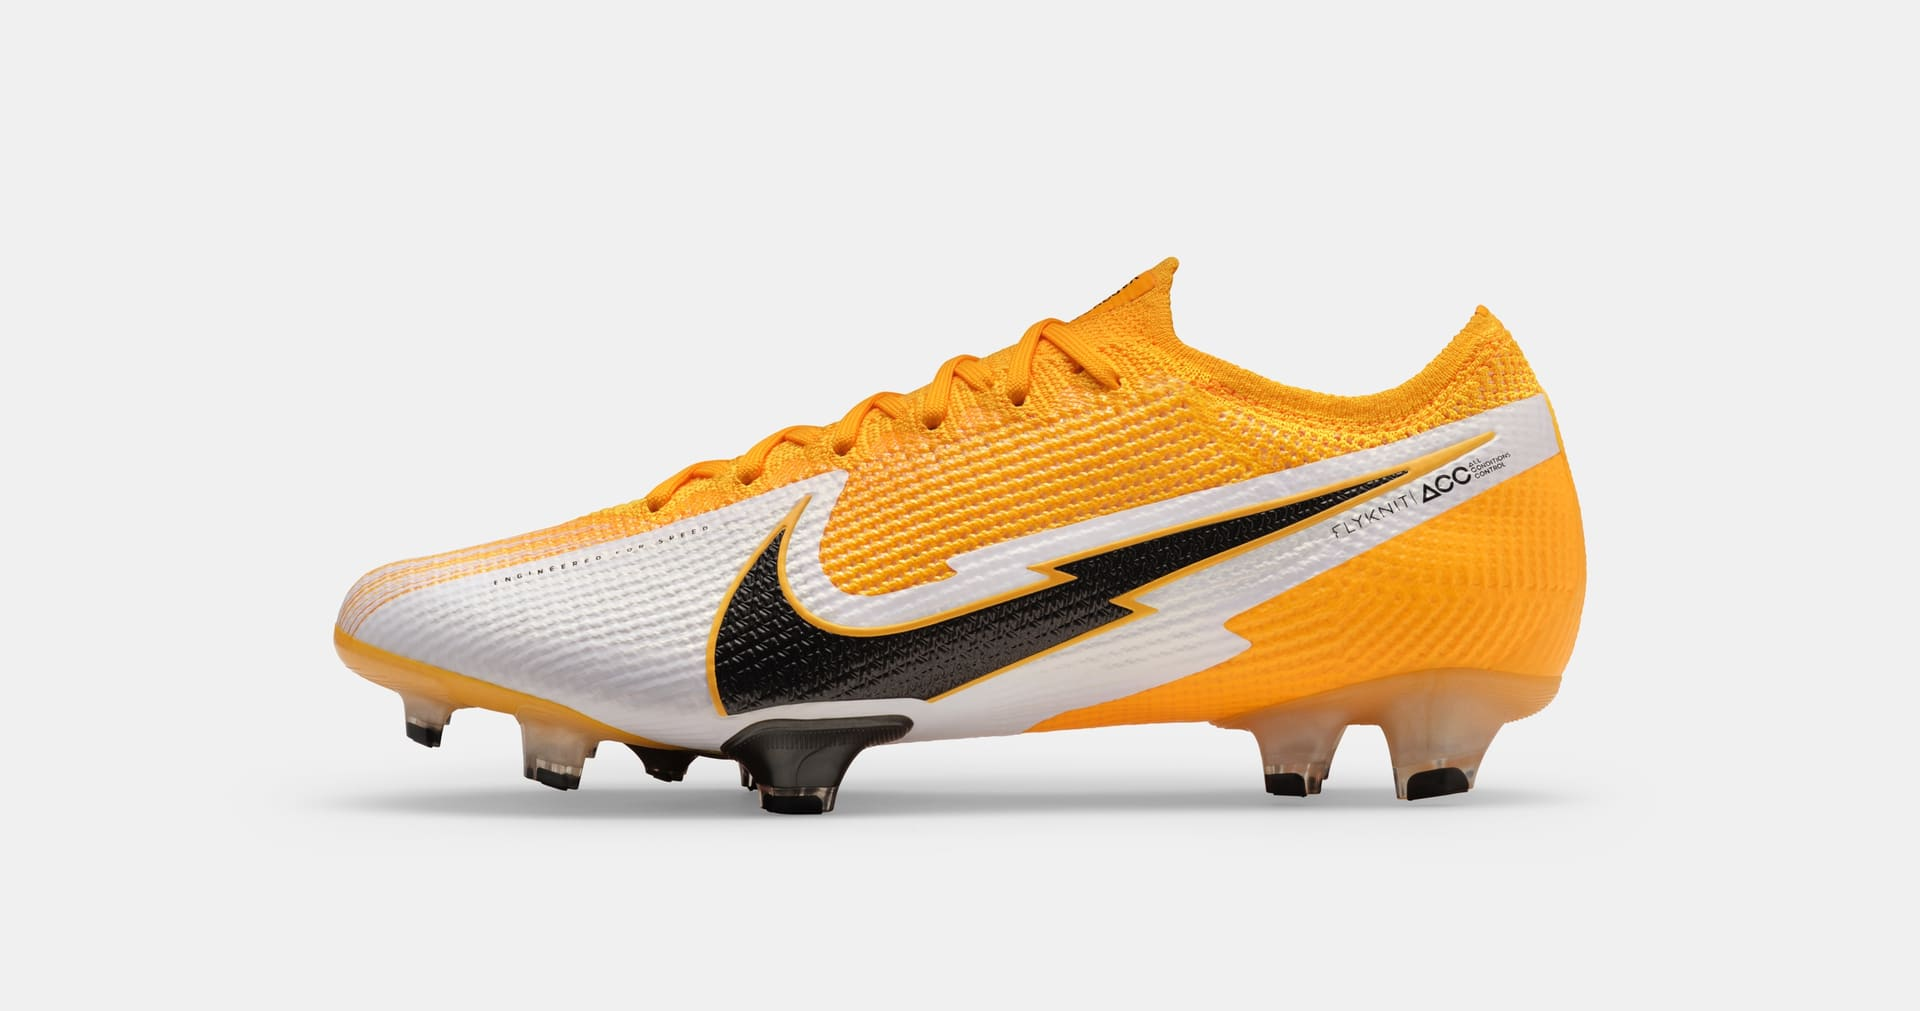 Sinewi Corredor Hacer la cama  Nike Mercurial Vapor 13 Elite FG Firm-Ground Soccer Cleat. Nike.com